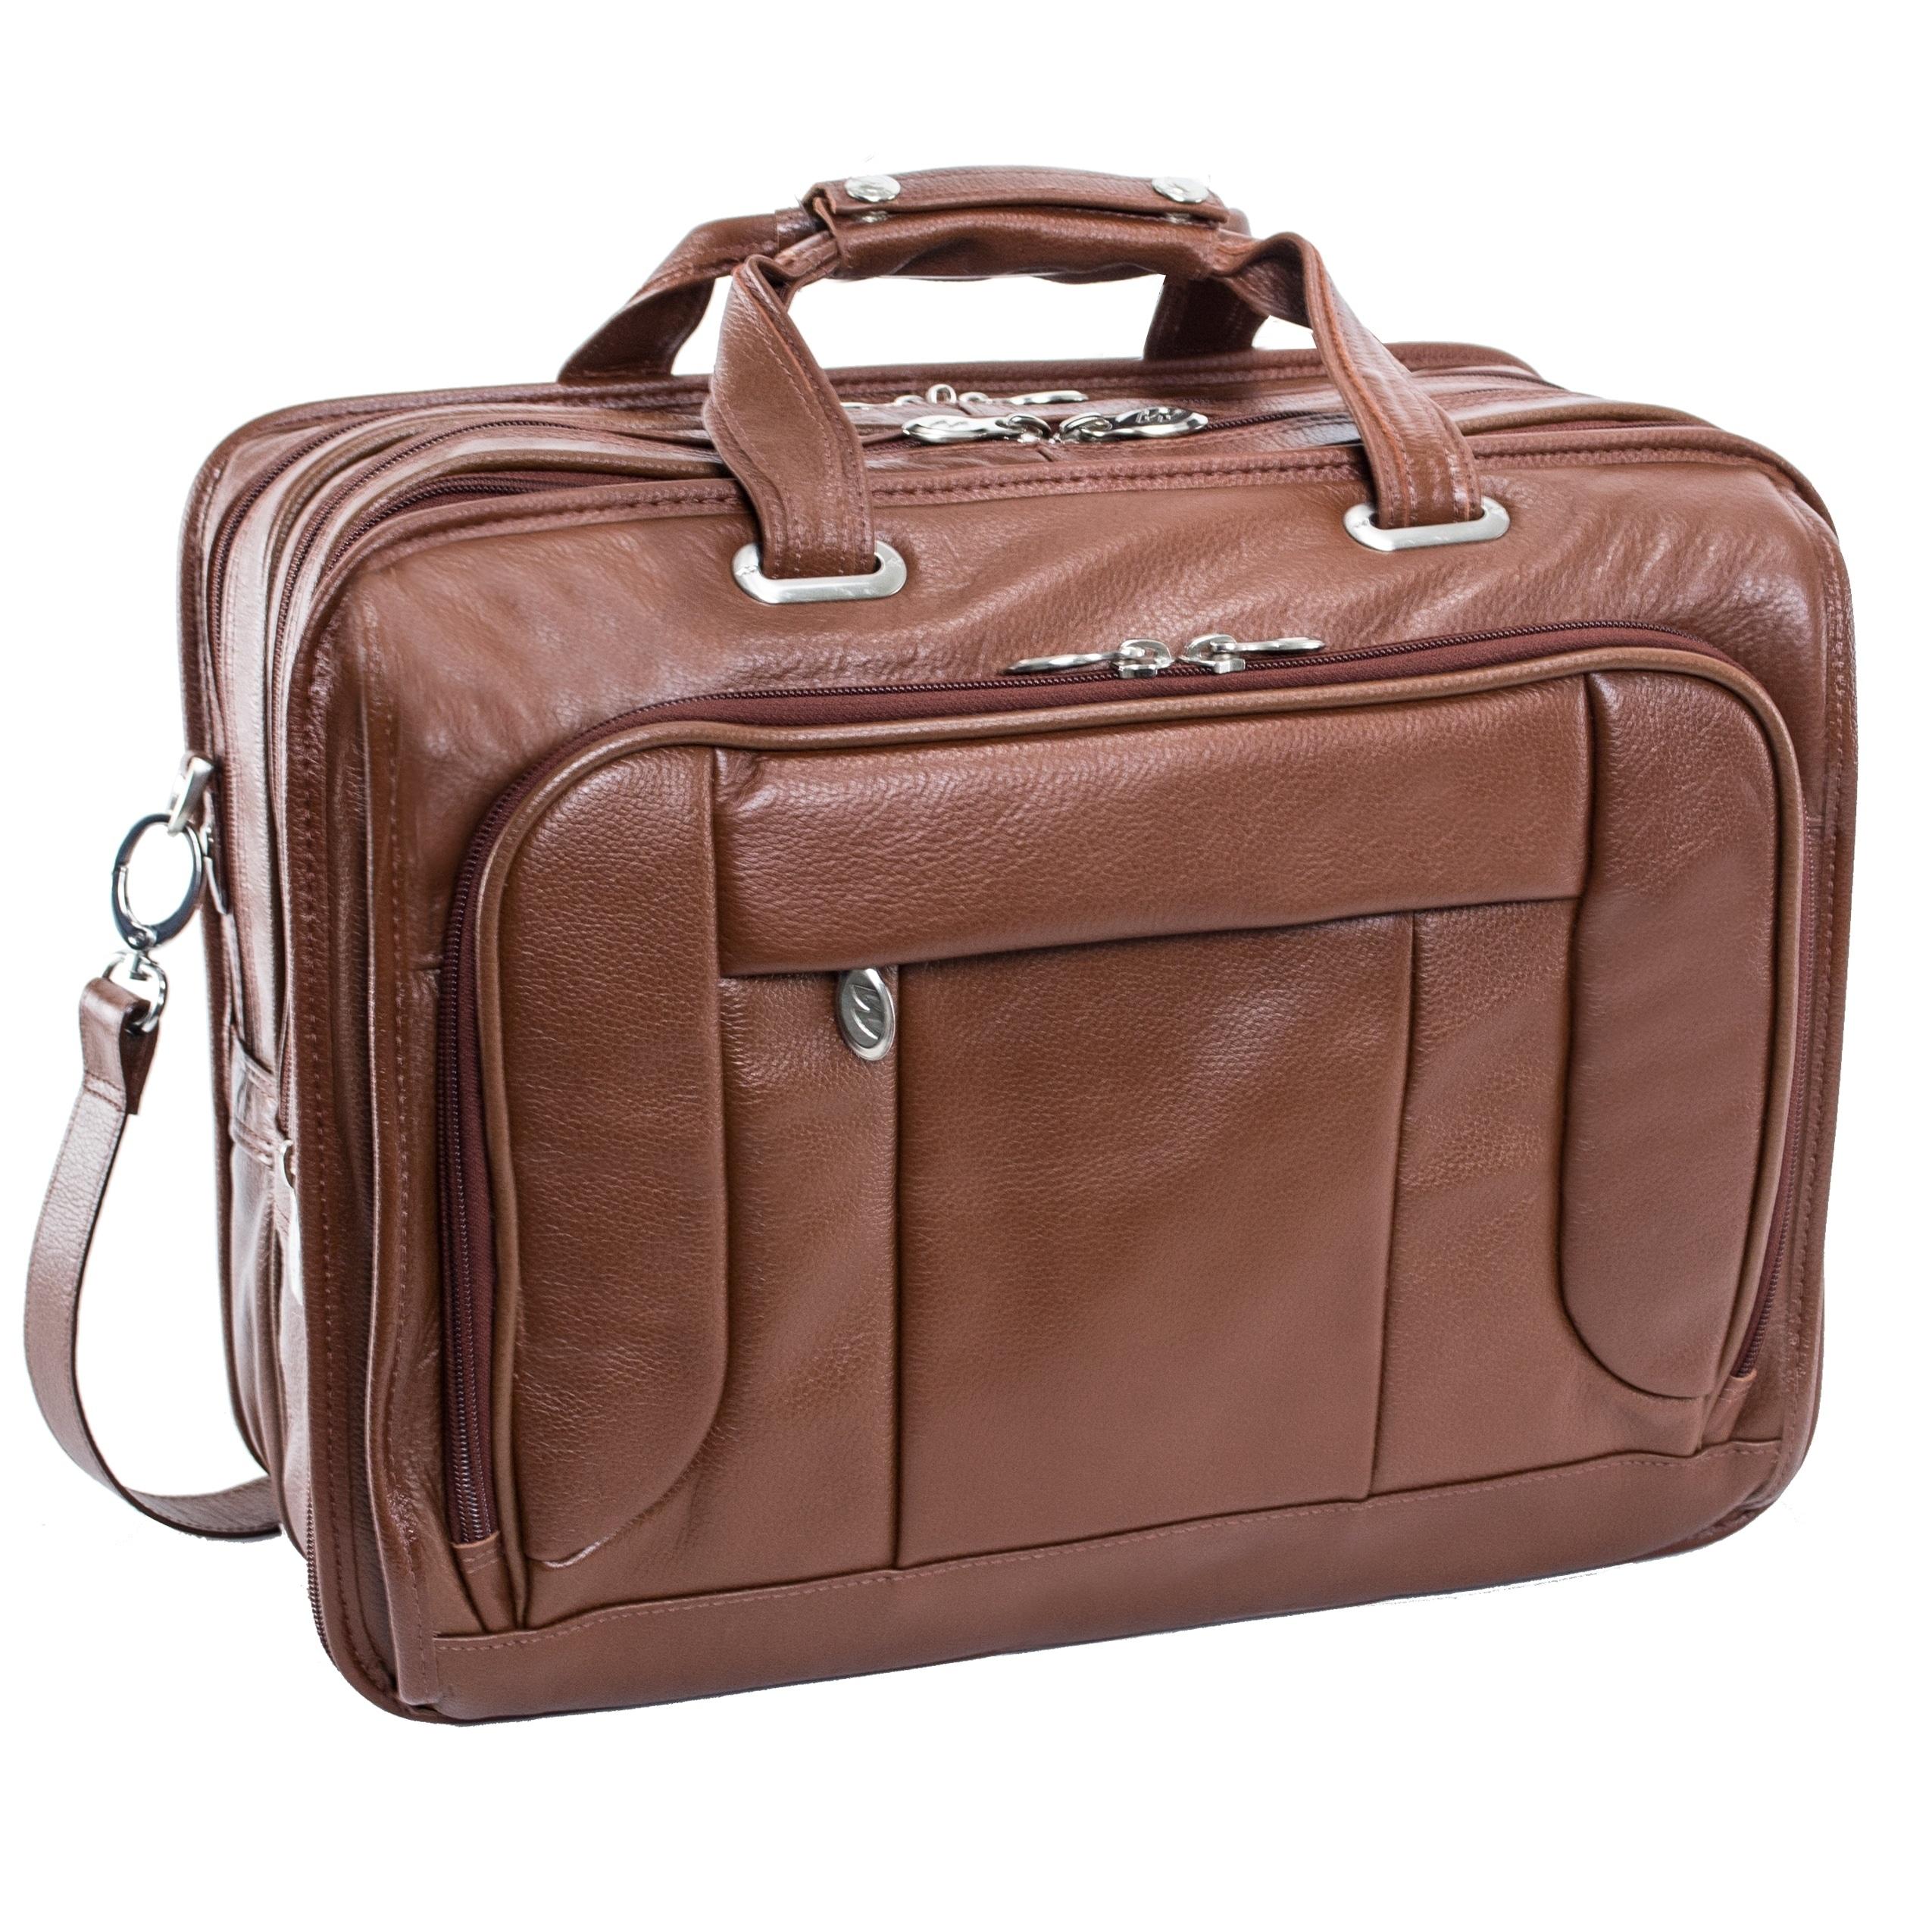 b4e4c47ca44 Shop McKlein West Town Checkpoint-friendly Wheeled Laptop Case ...